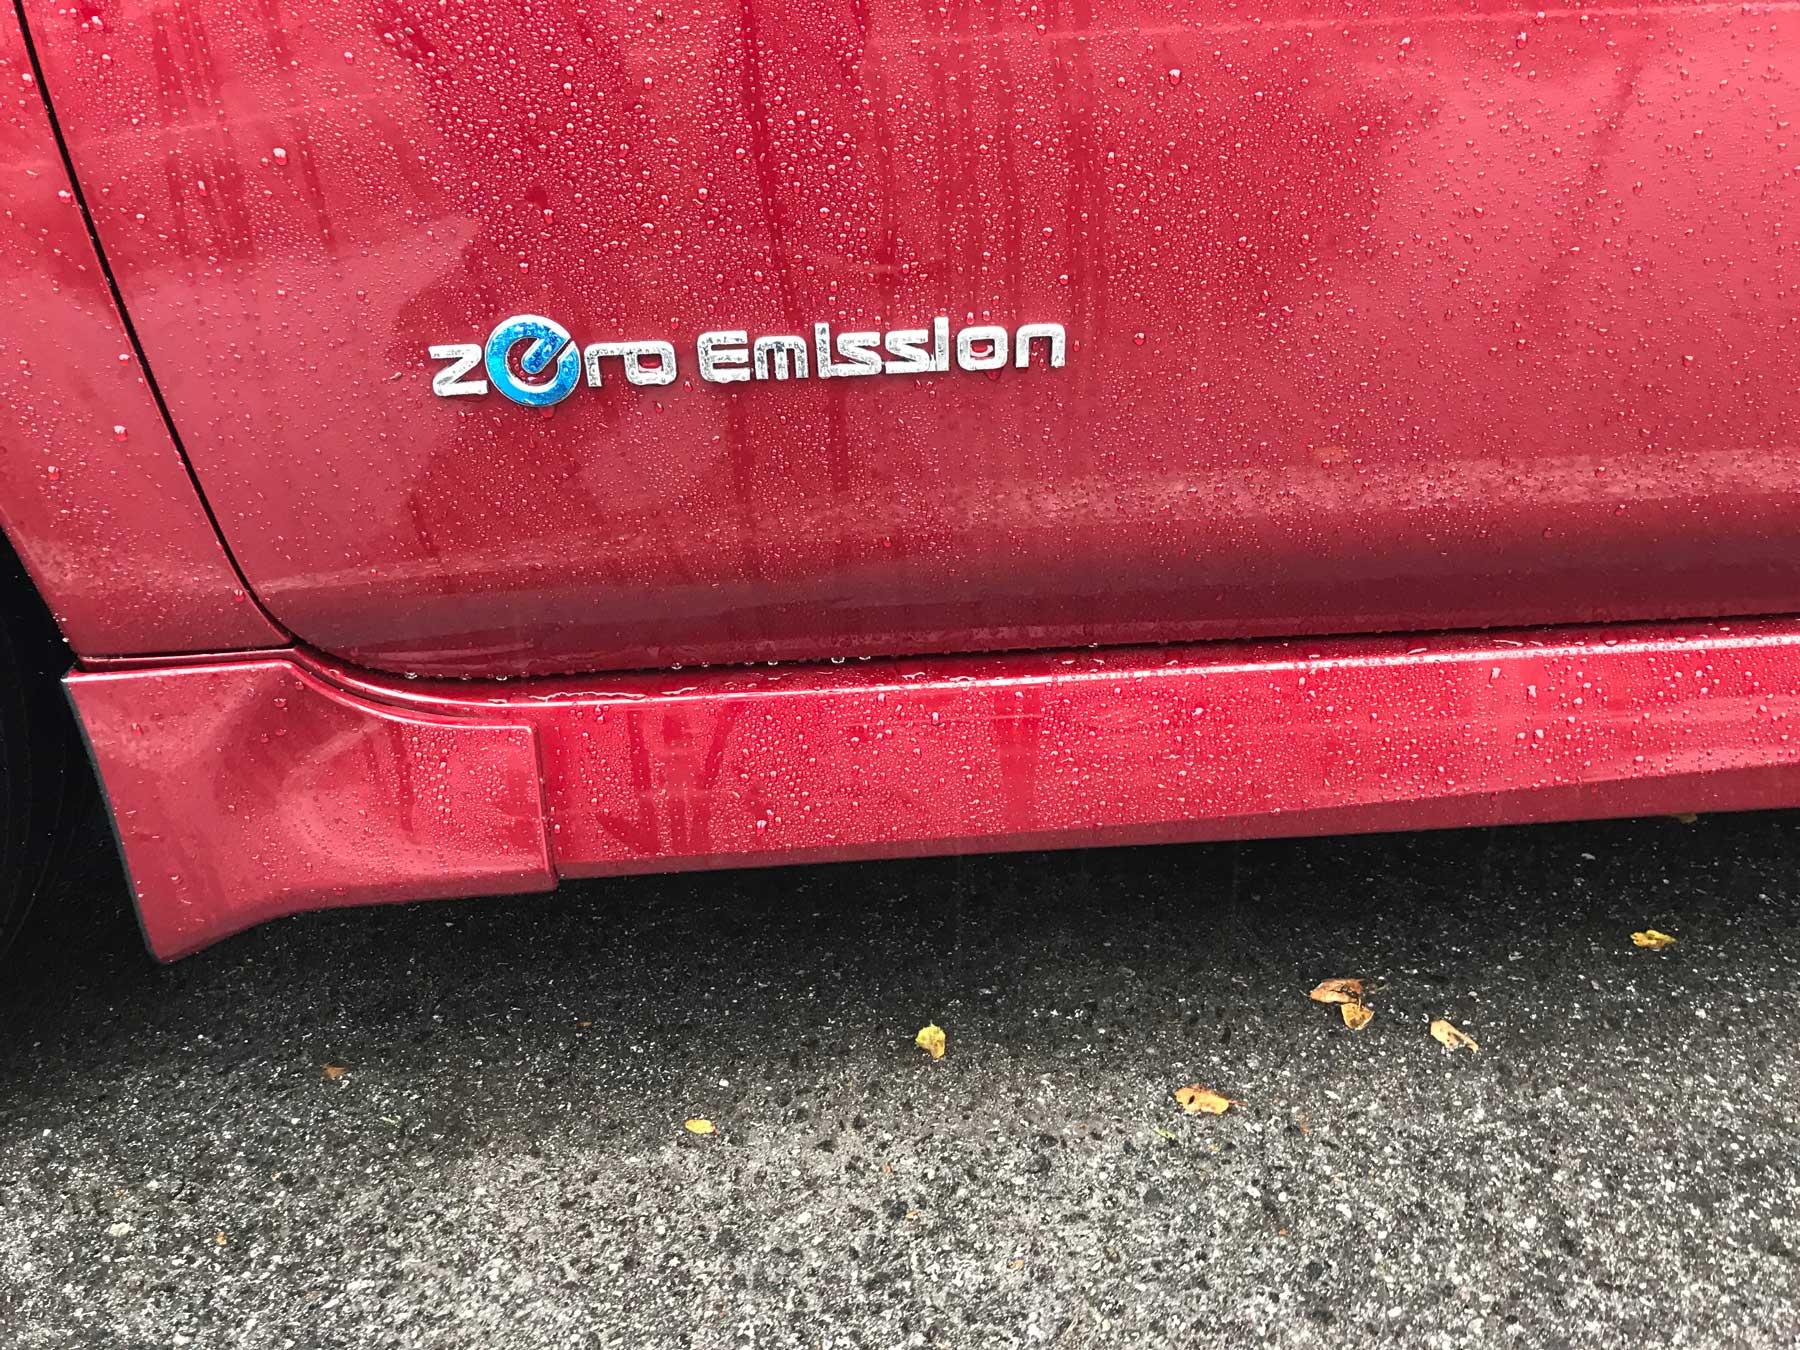 Nissan-Leaf-zero-emission.jpg